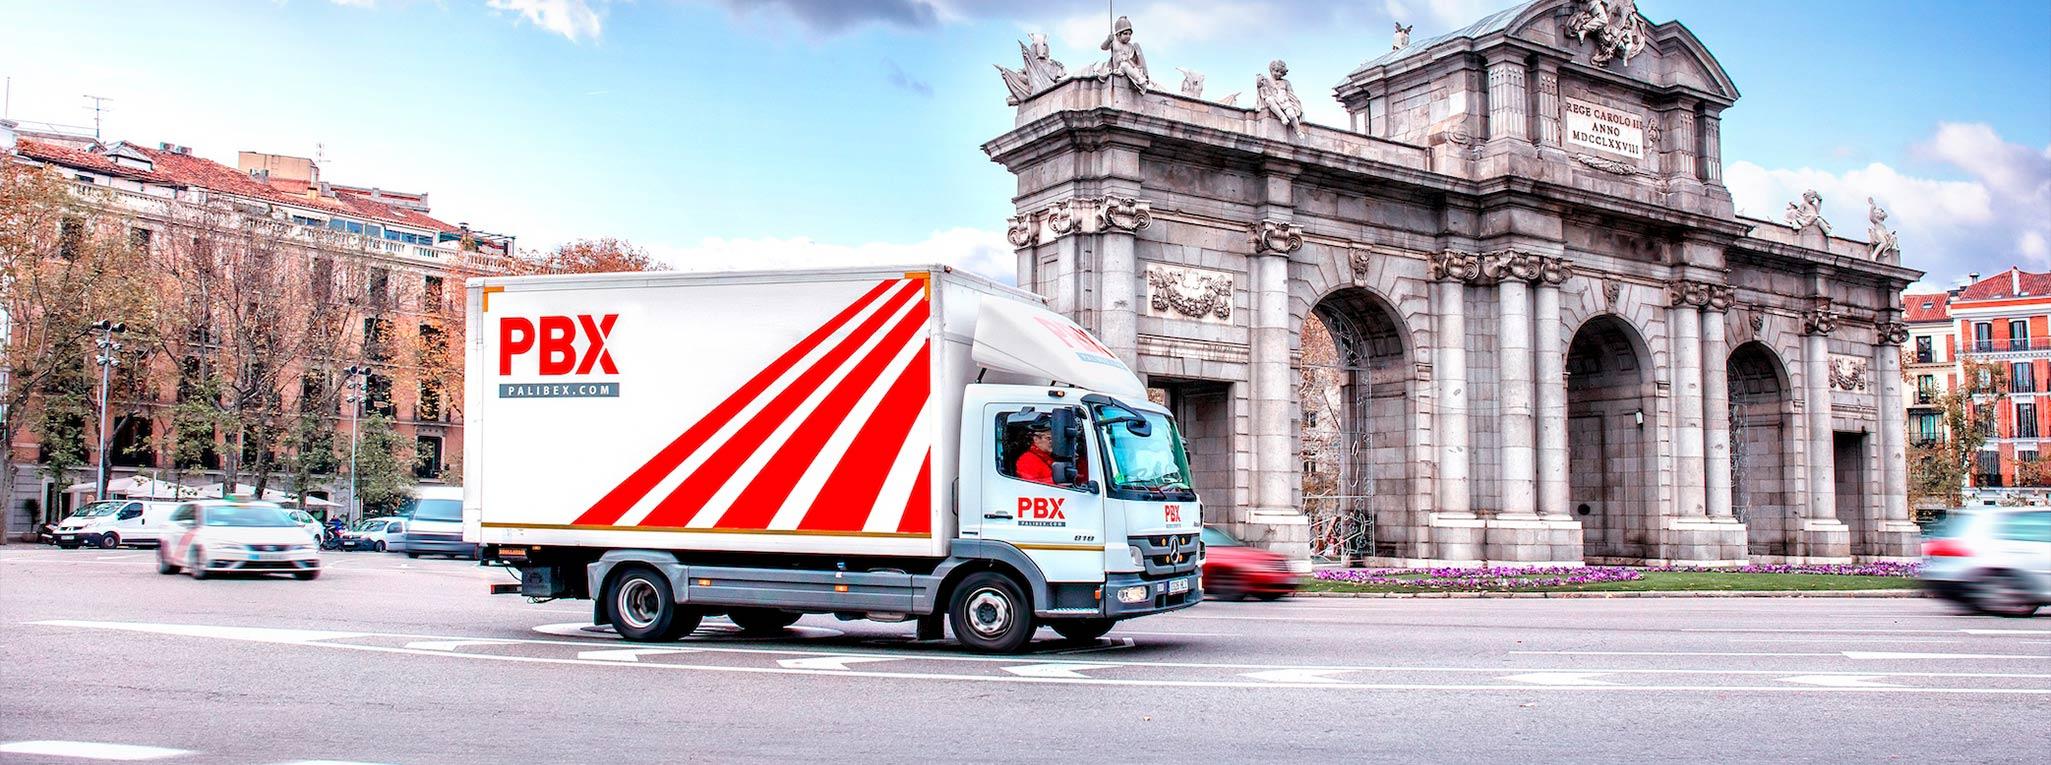 balance parcial 2021 - palibex - camion reparto